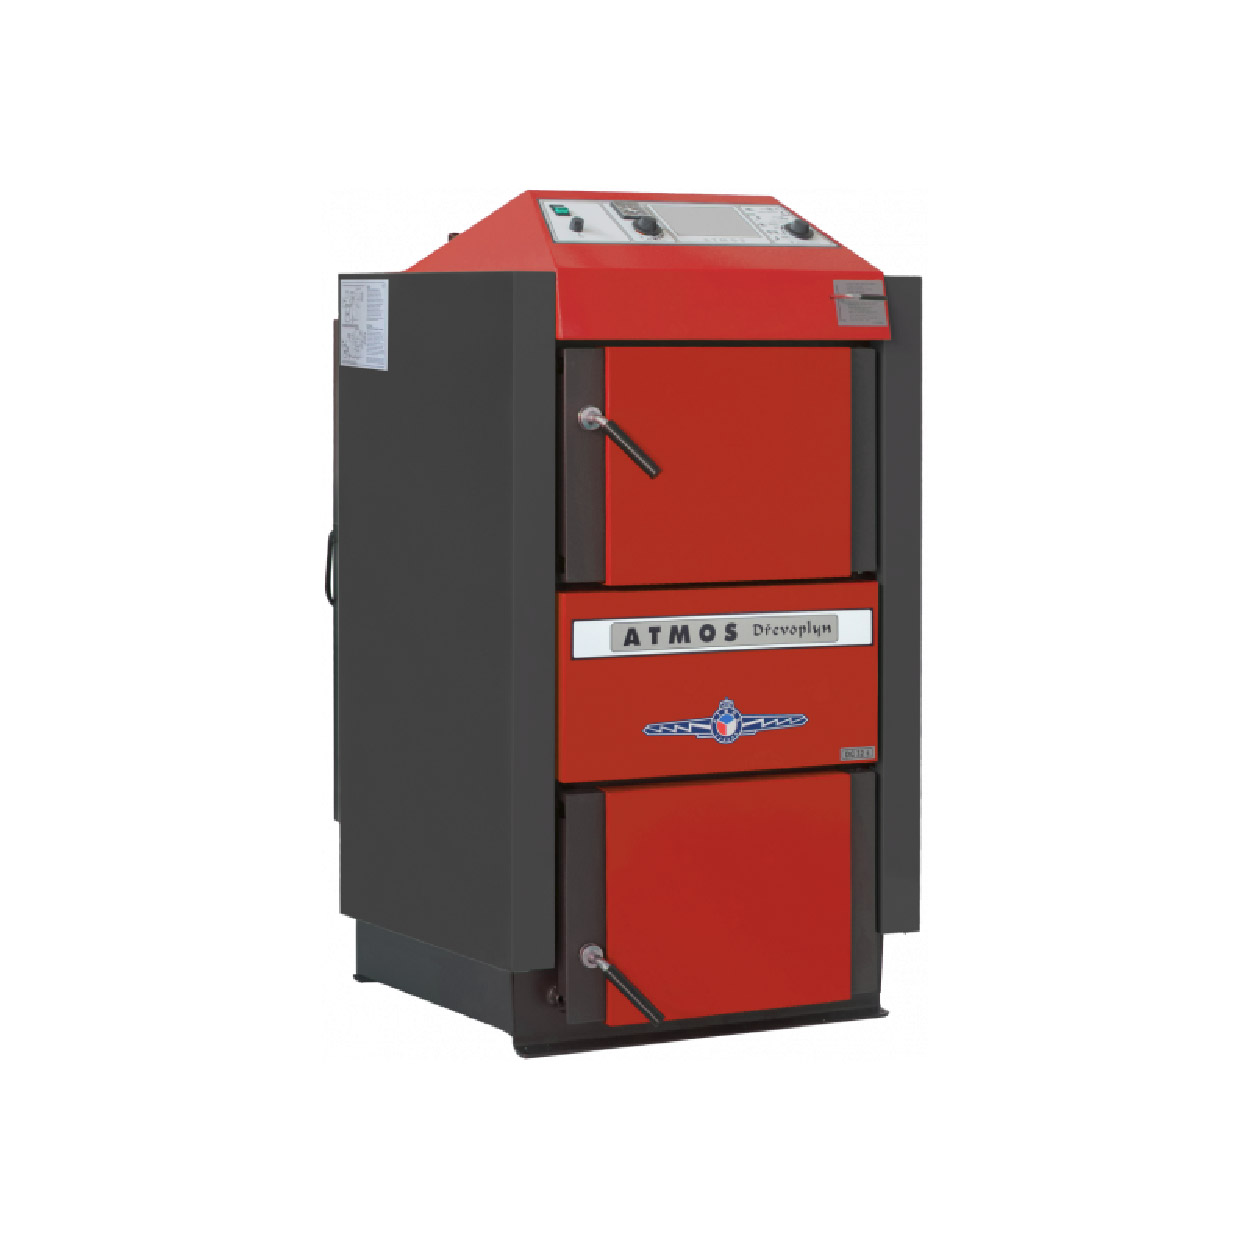 Centrala termica pe lemne ATMOS DC30SX 30 kW fornello imagine